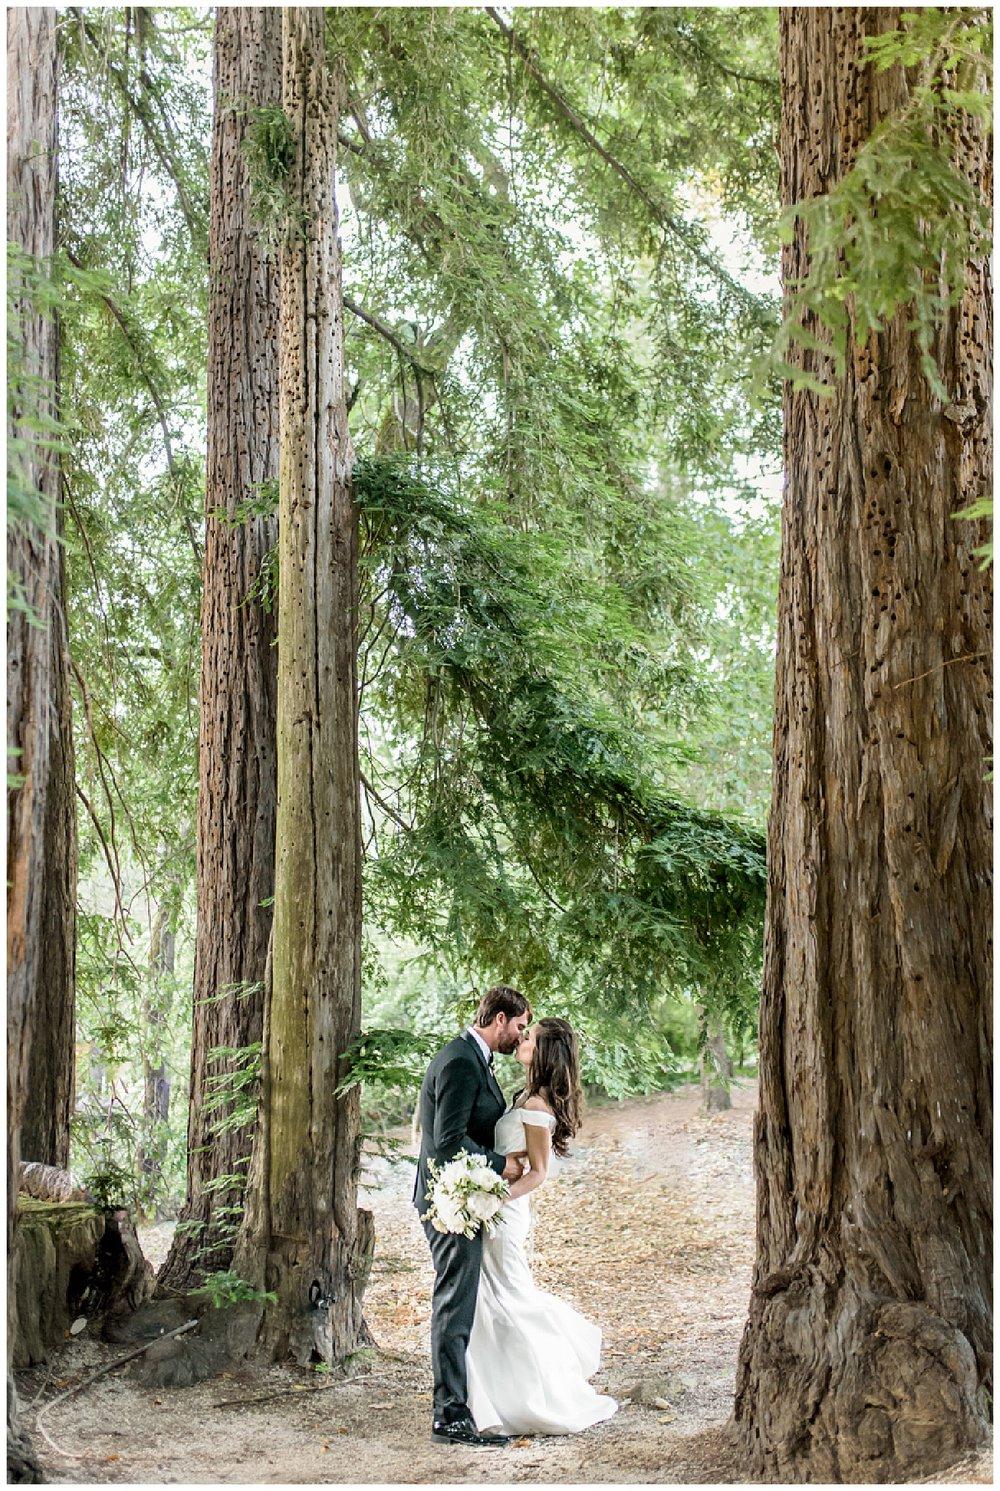 Janine_Licare_Photography_San_Francisco_Wedding_Photographer_0146.jpg